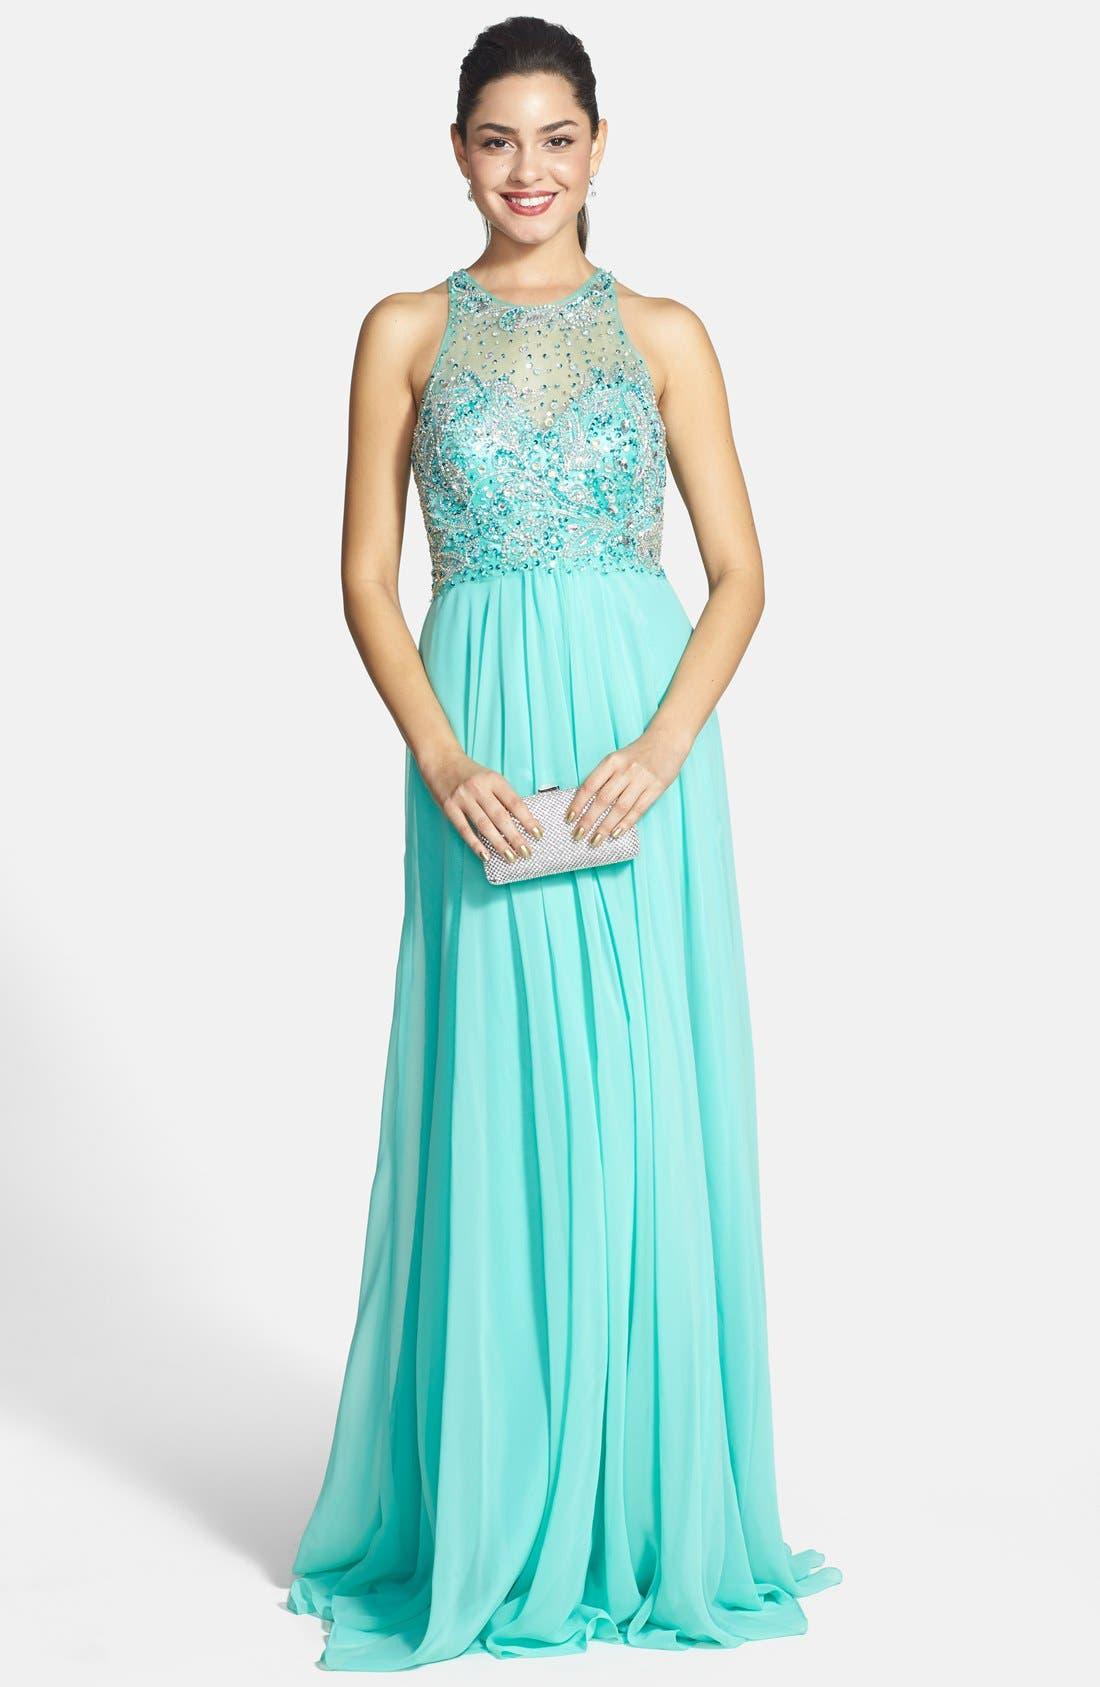 Alternate Image 1 Selected - Faviana Embellished Chiffon Gown